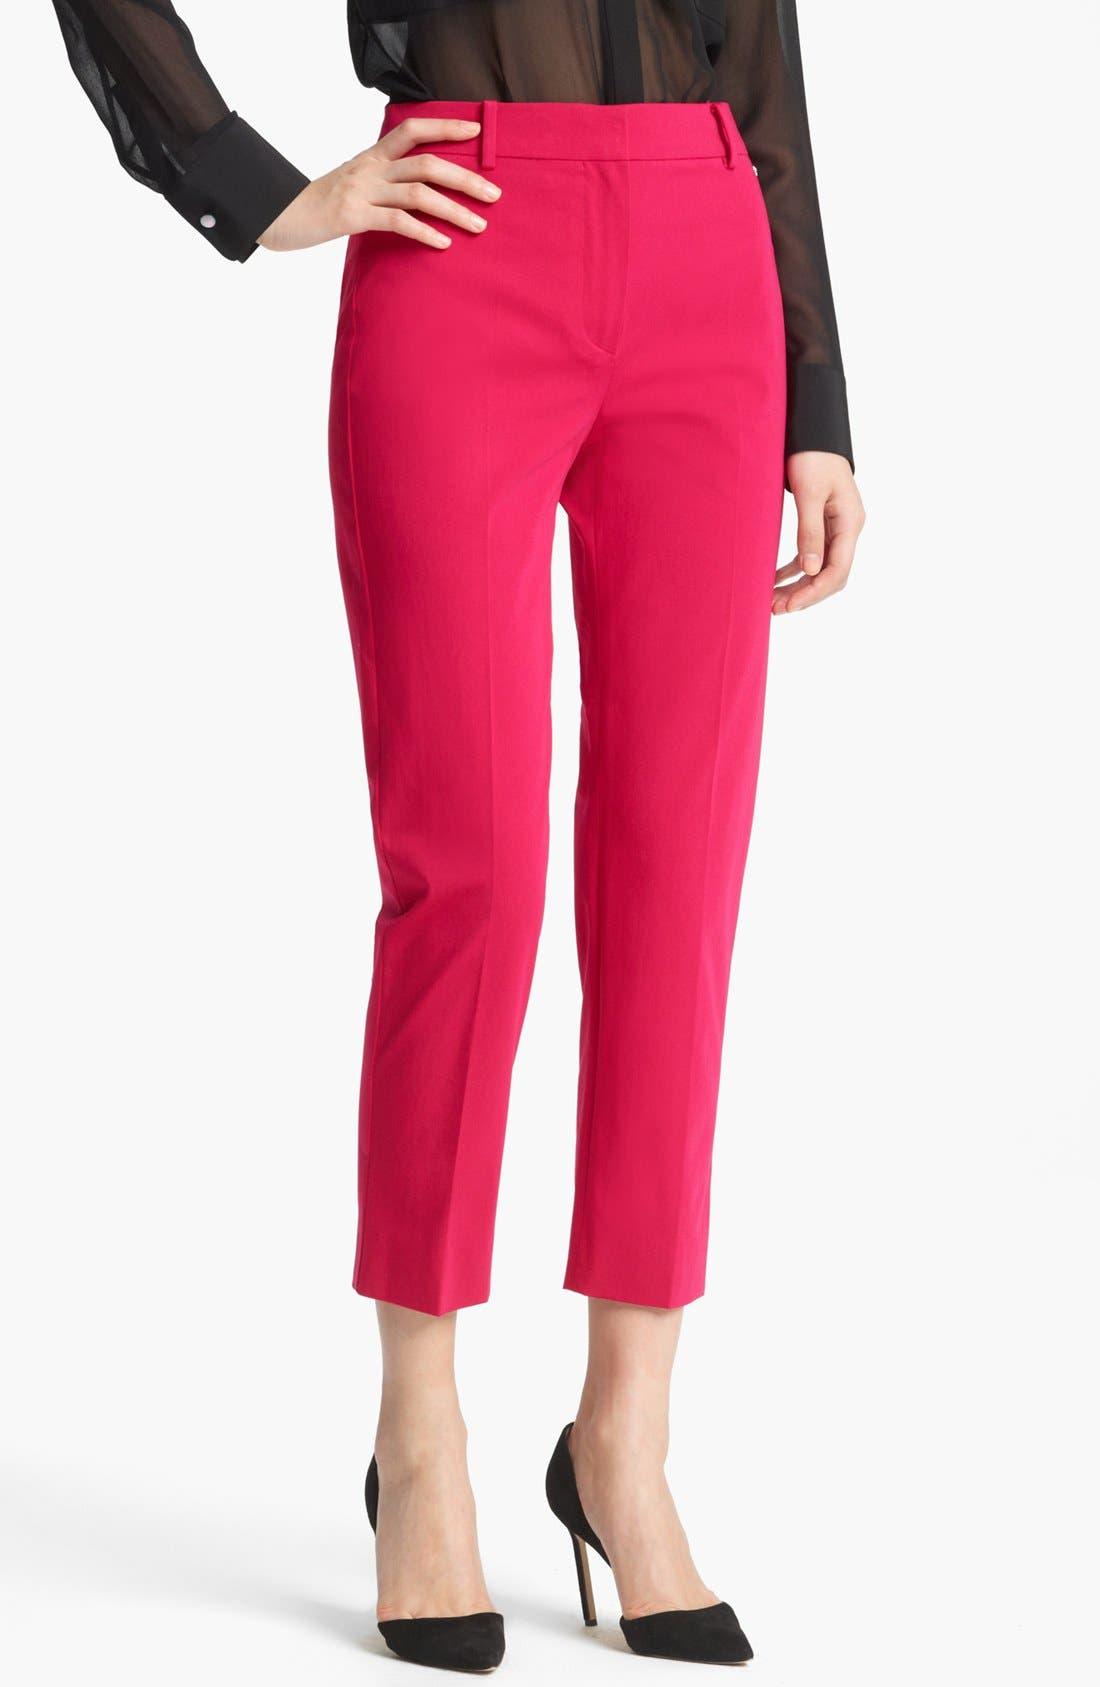 Main Image - Max Mara 'Genova' Stretch Cotton Crop Pants